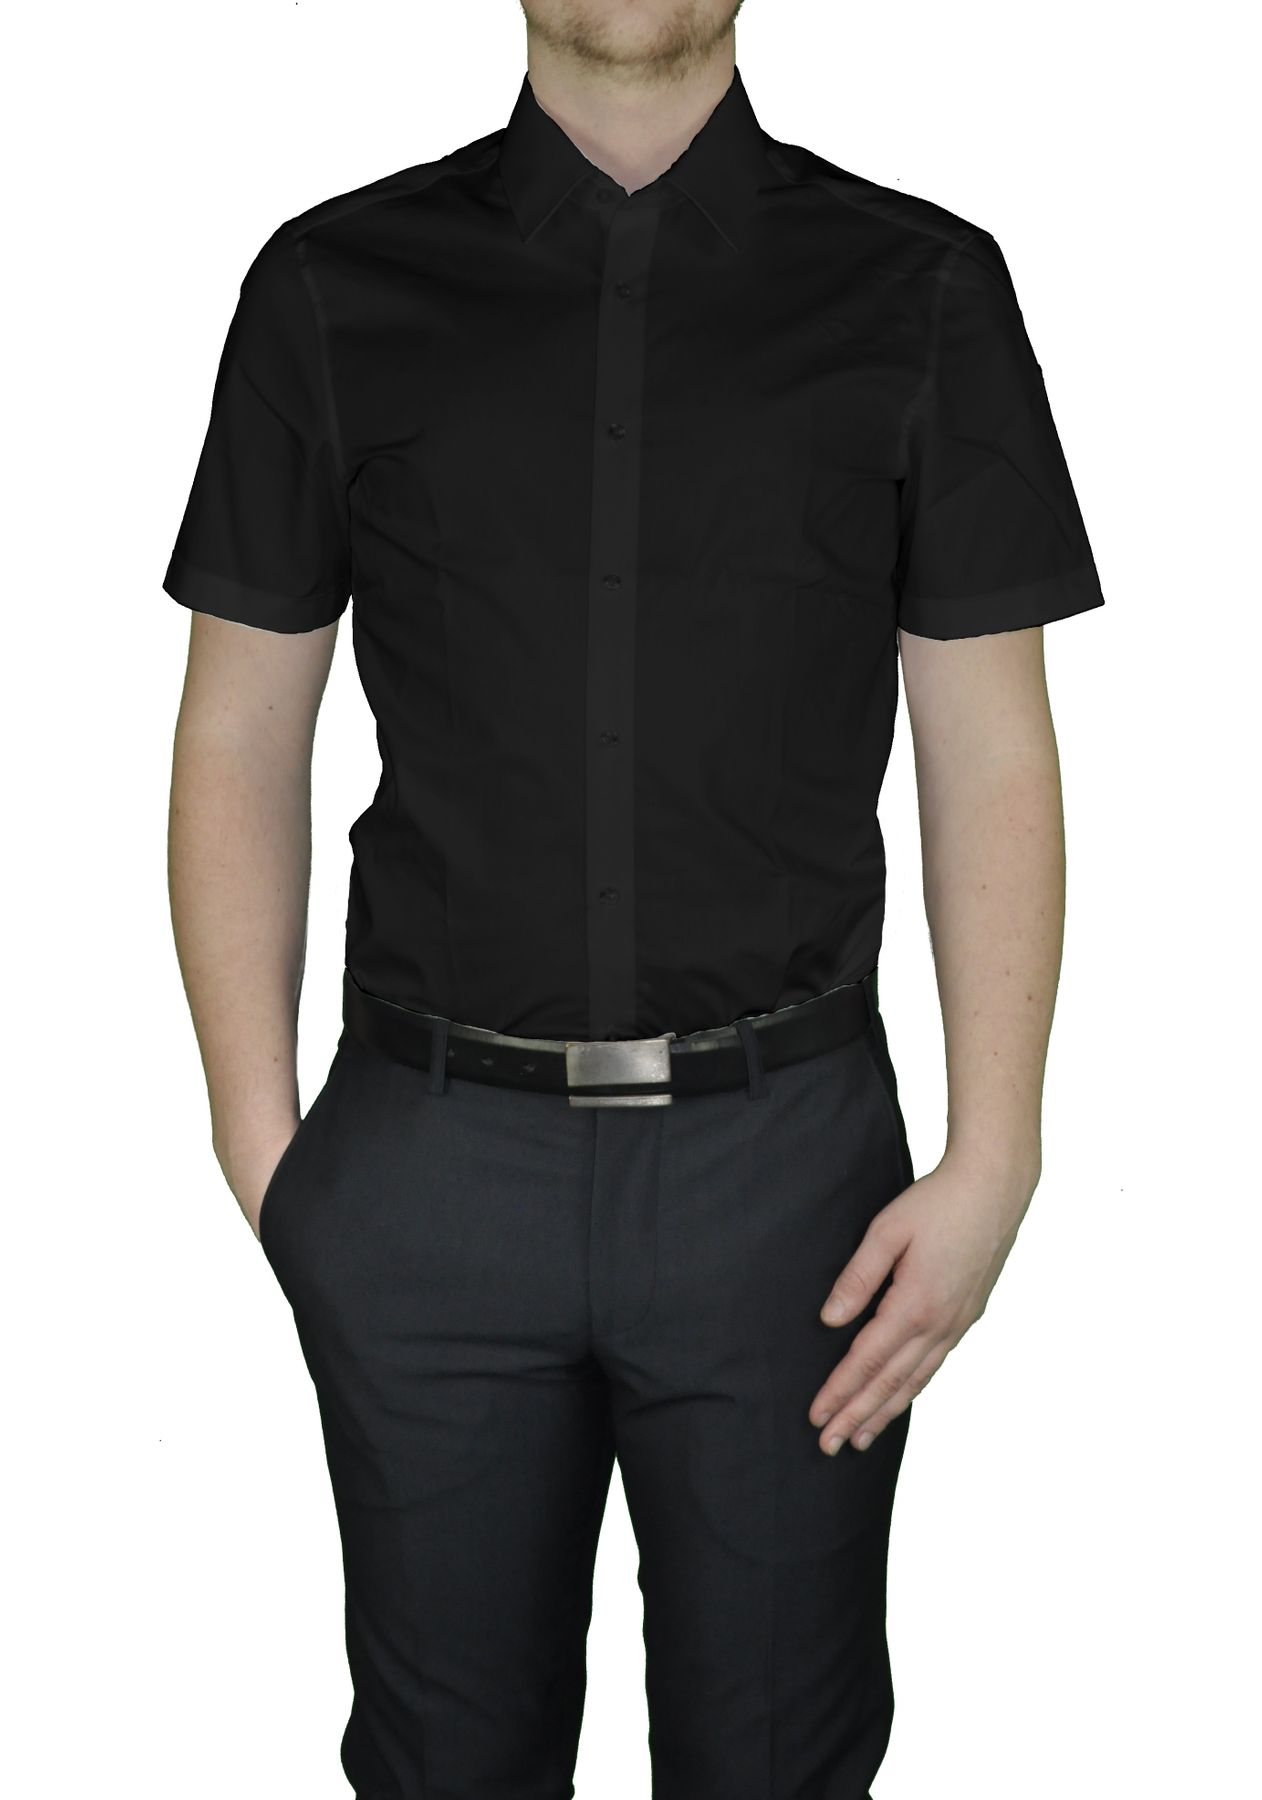 Bügelfreies Herren Slim fit kurzarm Hemd in verschiedenen Farben Marke Redmond (400930) – Bild 2